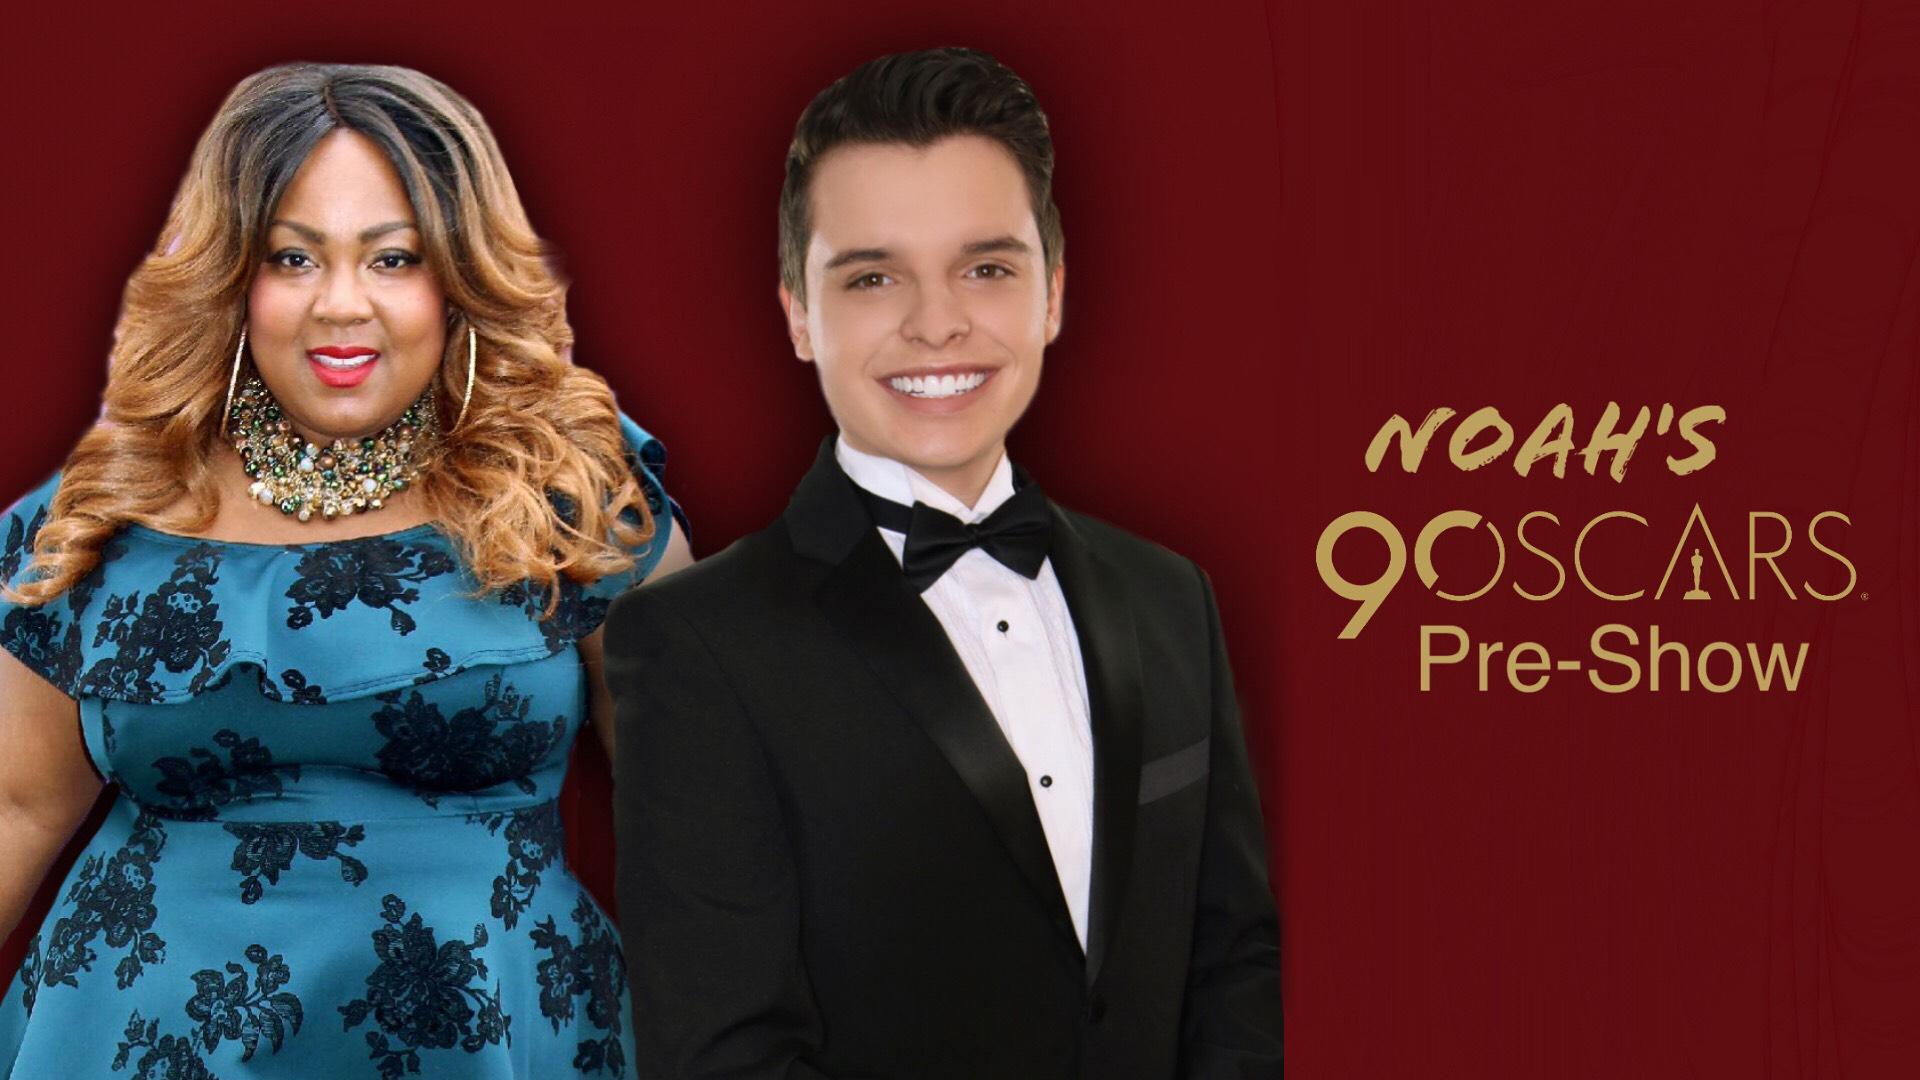 Noah's Oscars Pre-Show